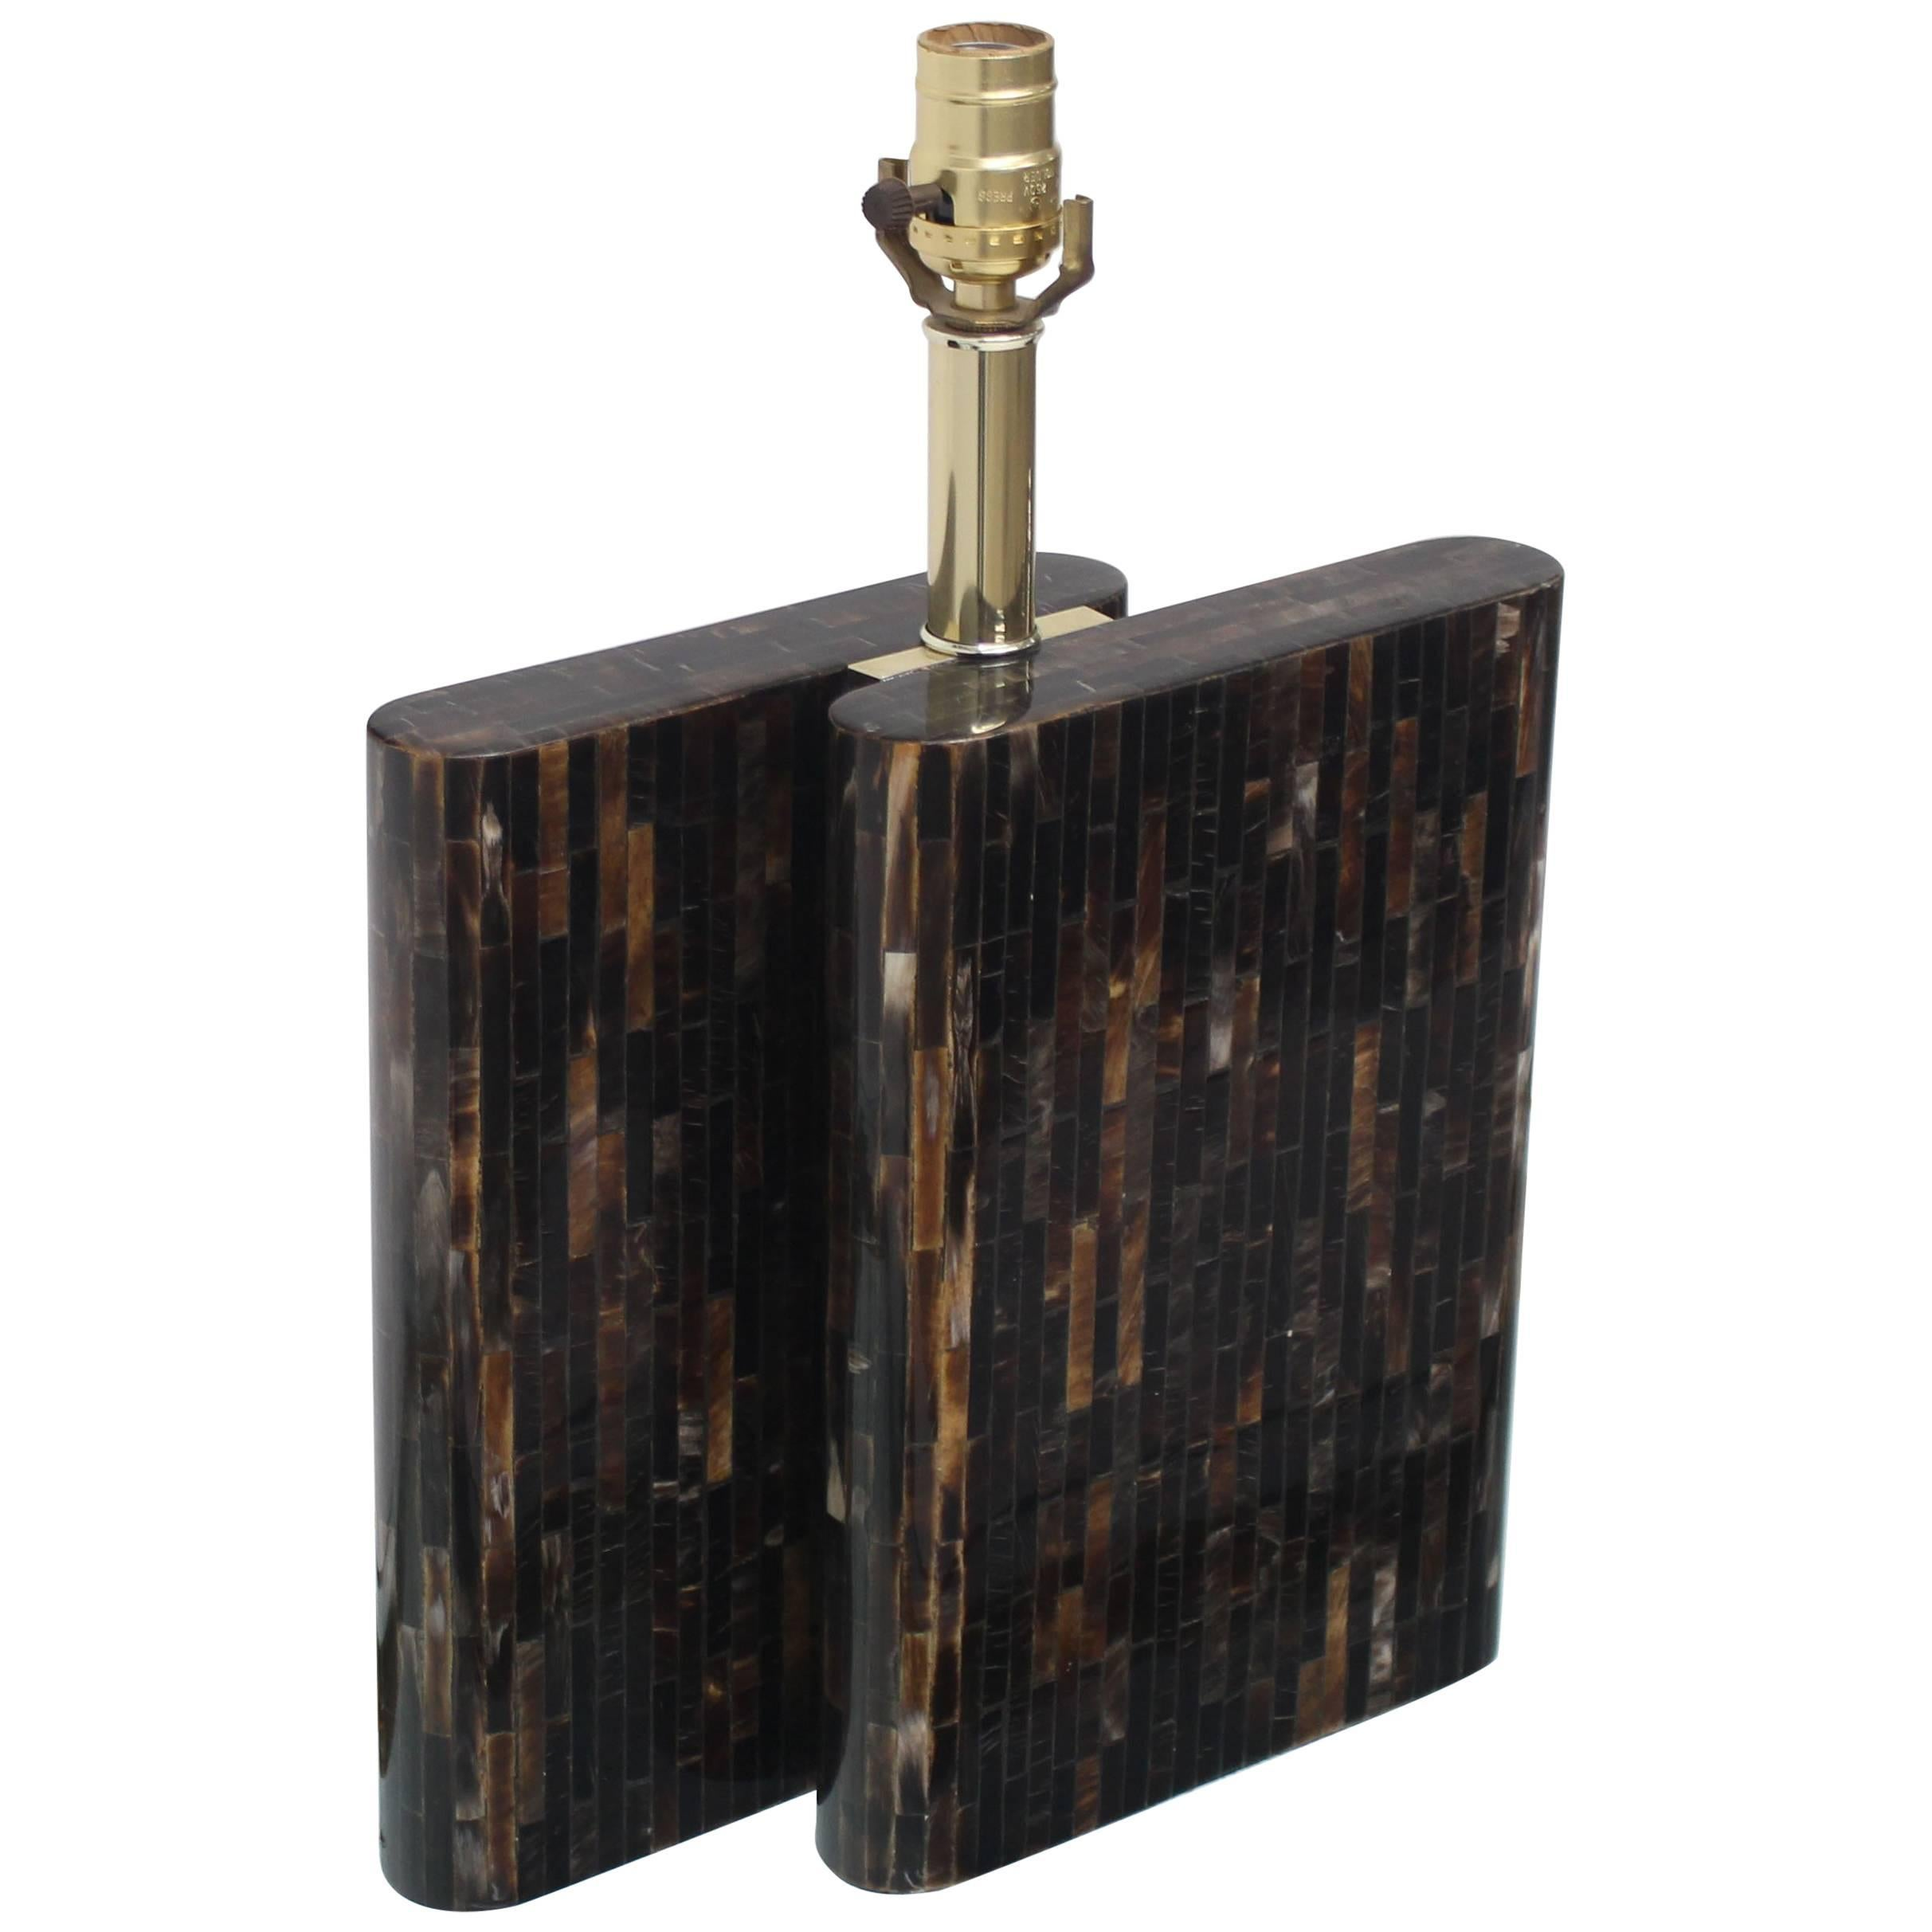 Tessellated Dark Bone Tile Table Lamp